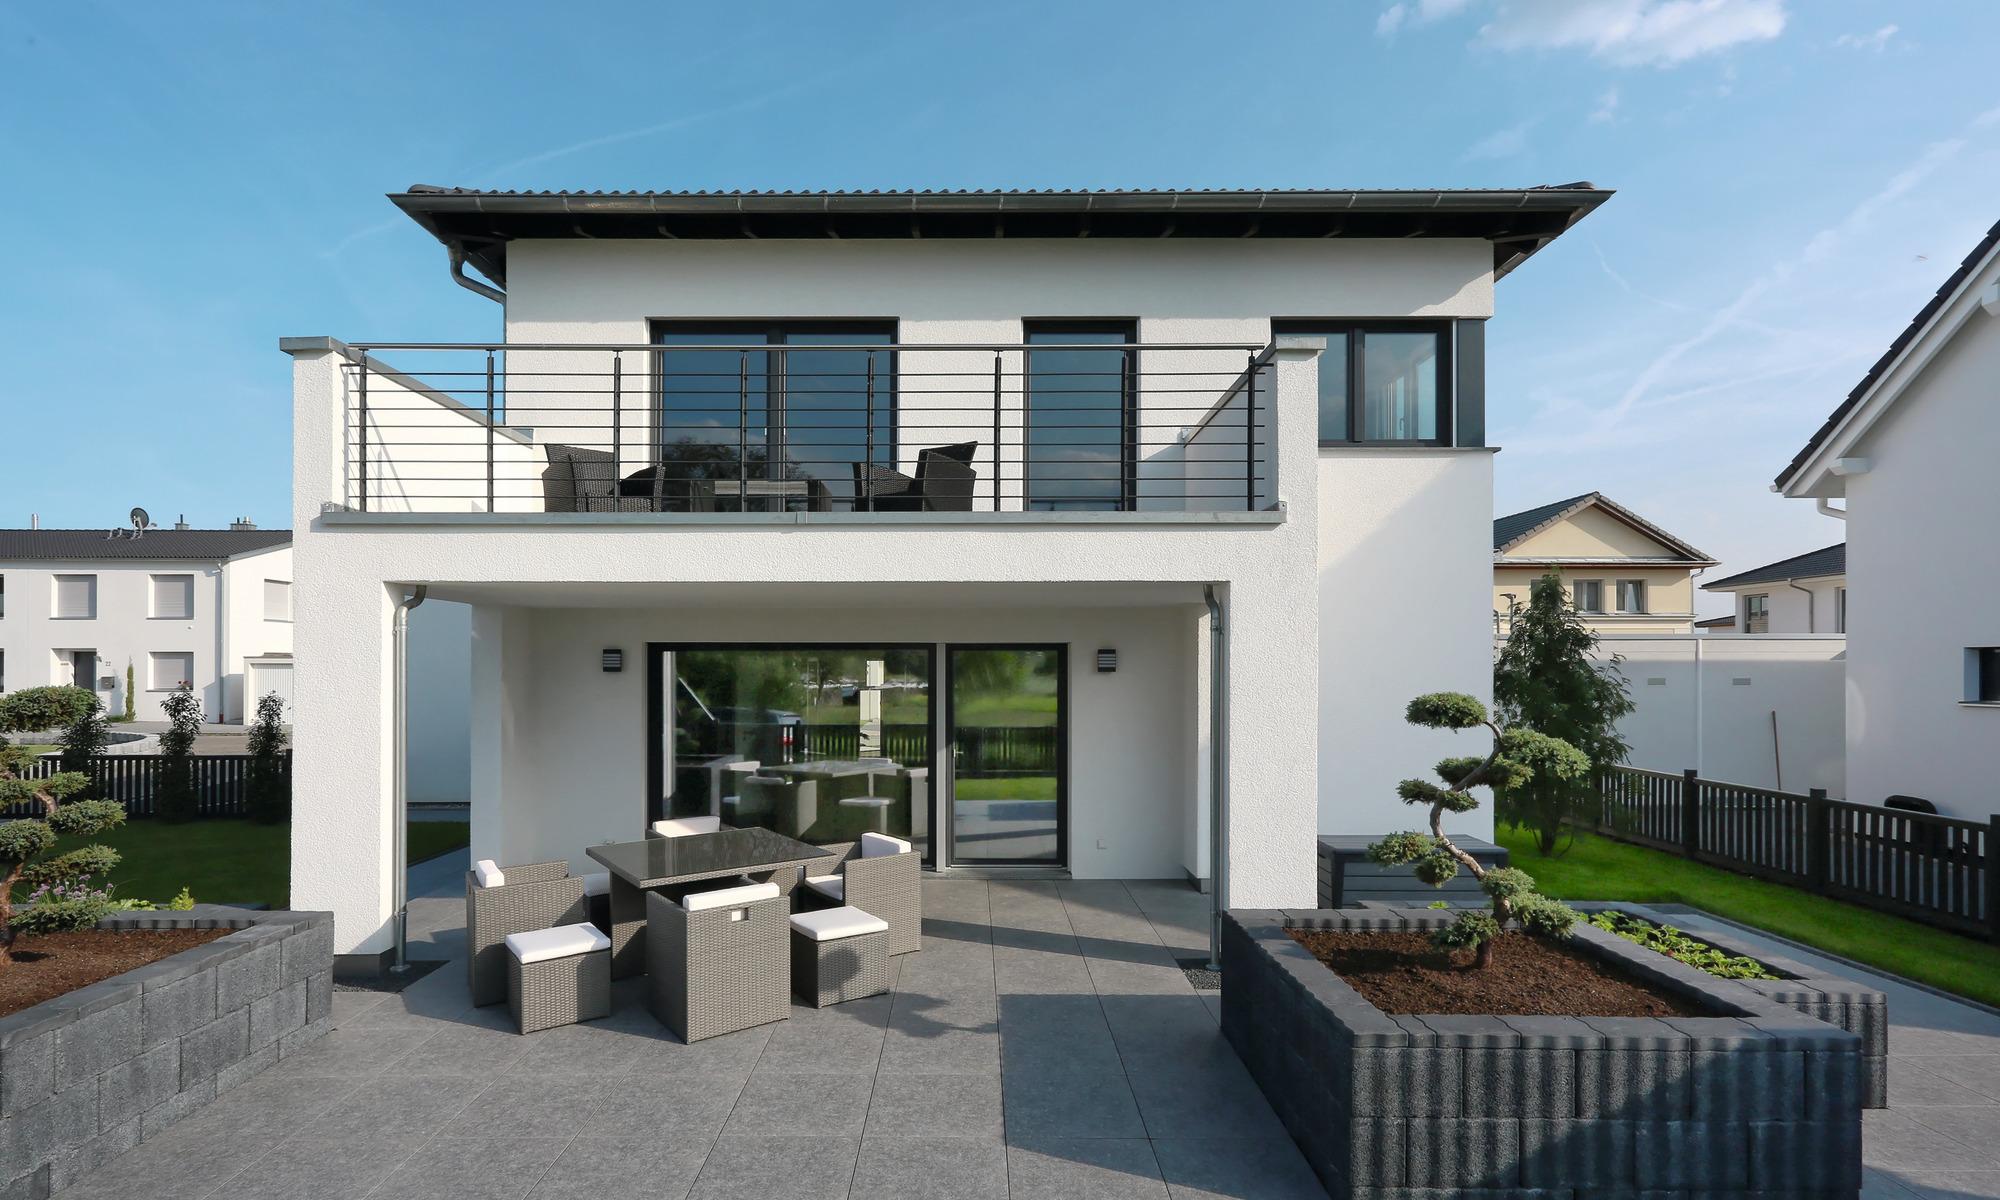 Haus mit Flachdach